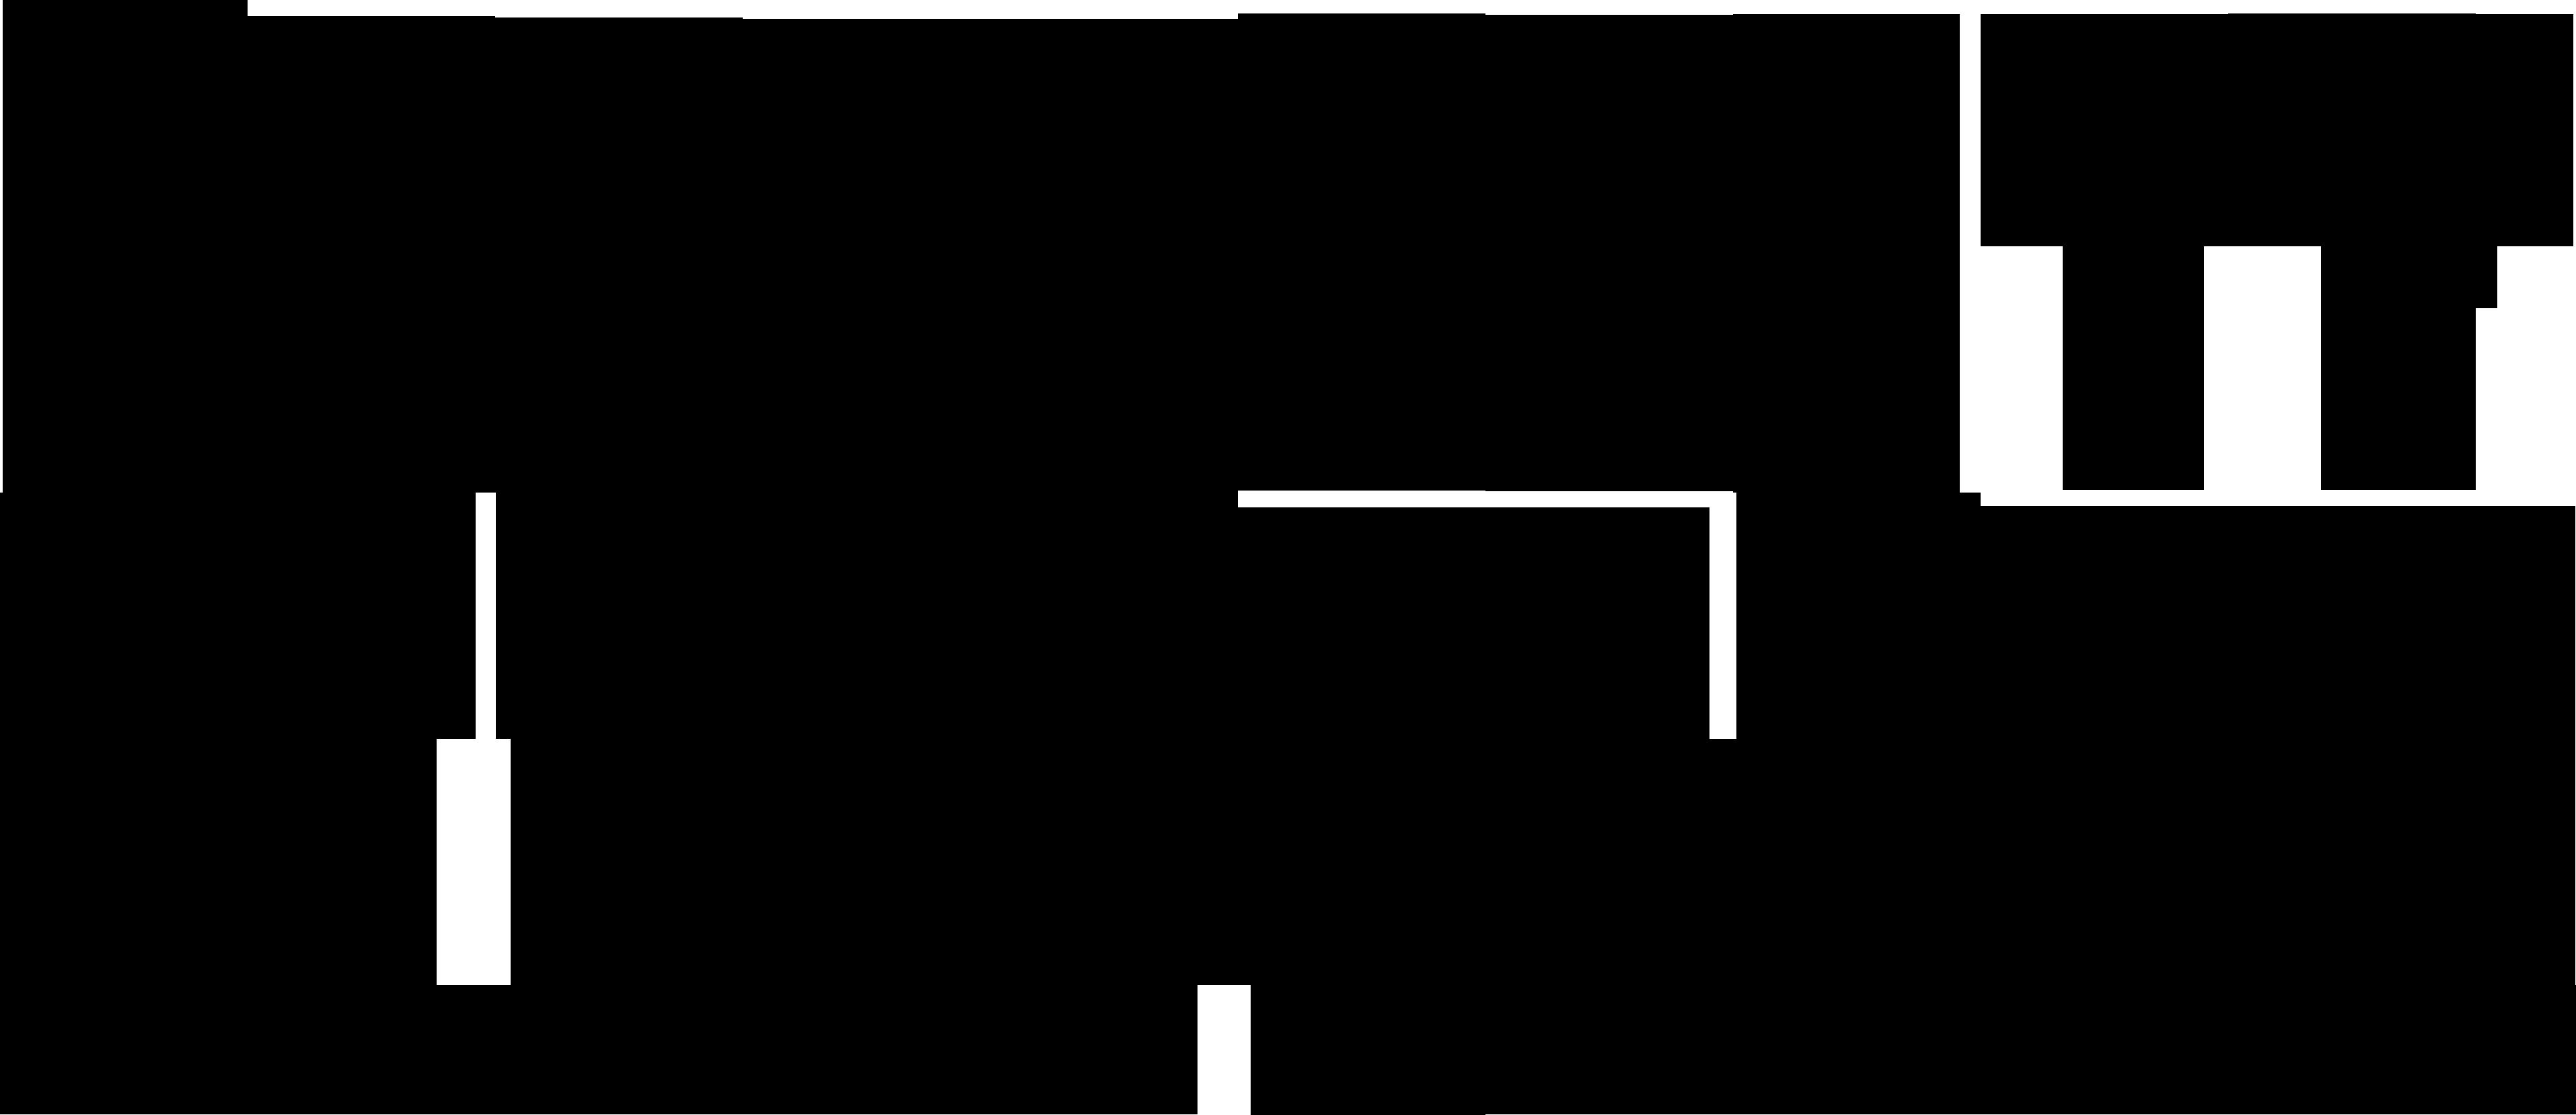 Logo For Call Of Duty Modern Warfare By Krissmed Steamgriddb